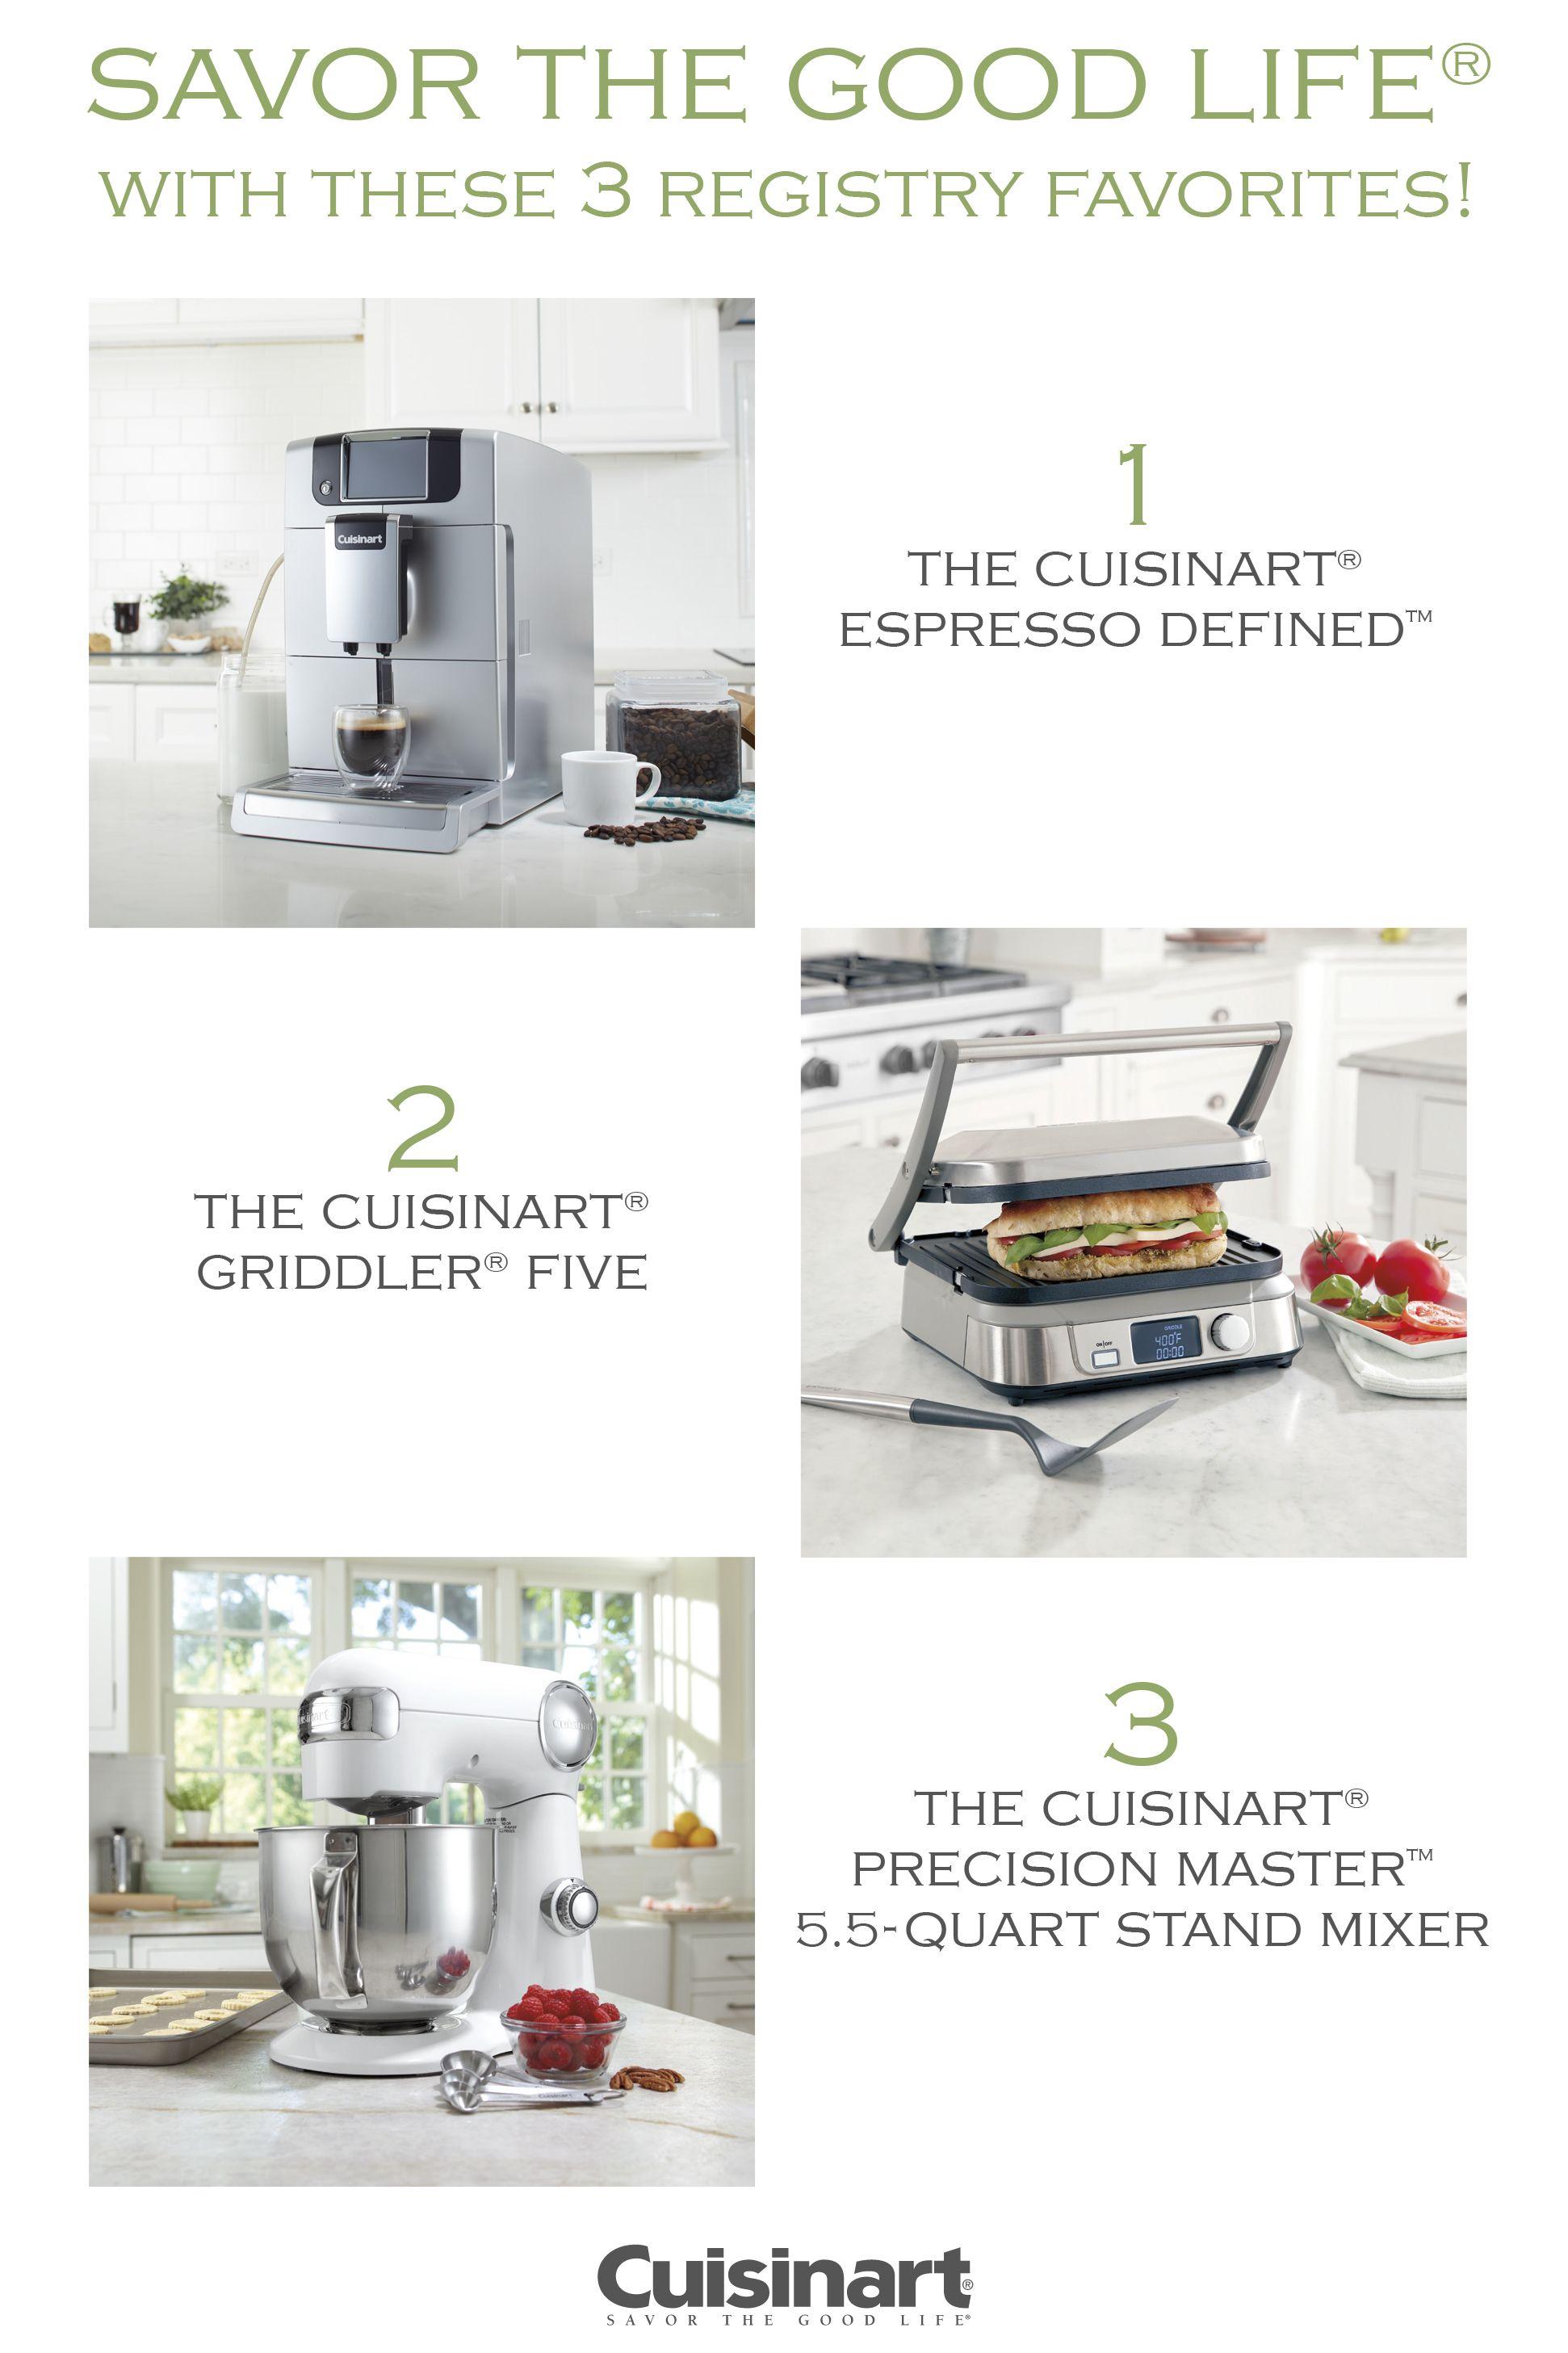 Cuisinart Registry Favorites Food Truck Business Plan Food Truck Design Fine Dining Recipes